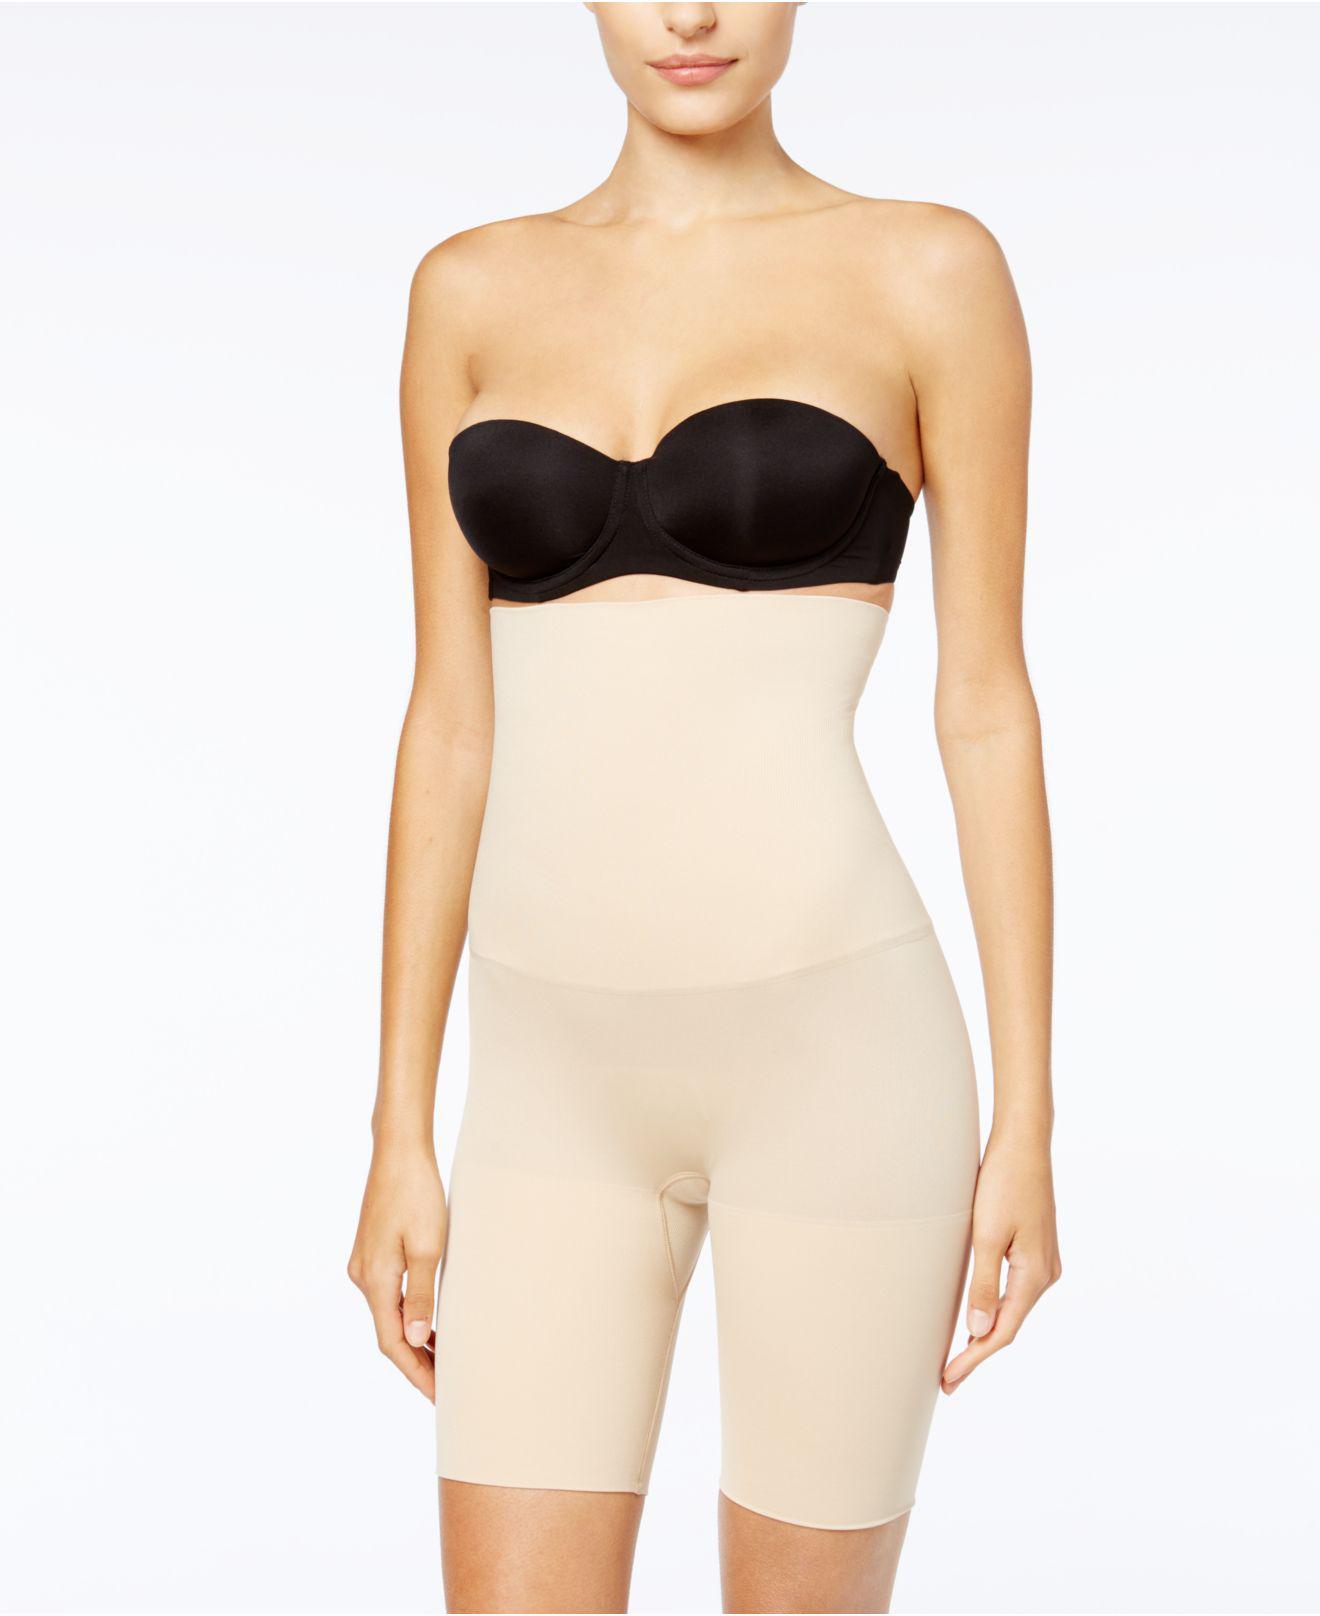 521220466e Maidenform. Women s Natural Ultra Tummy-control Seamless High Waist Thigh  Slimmer 12622